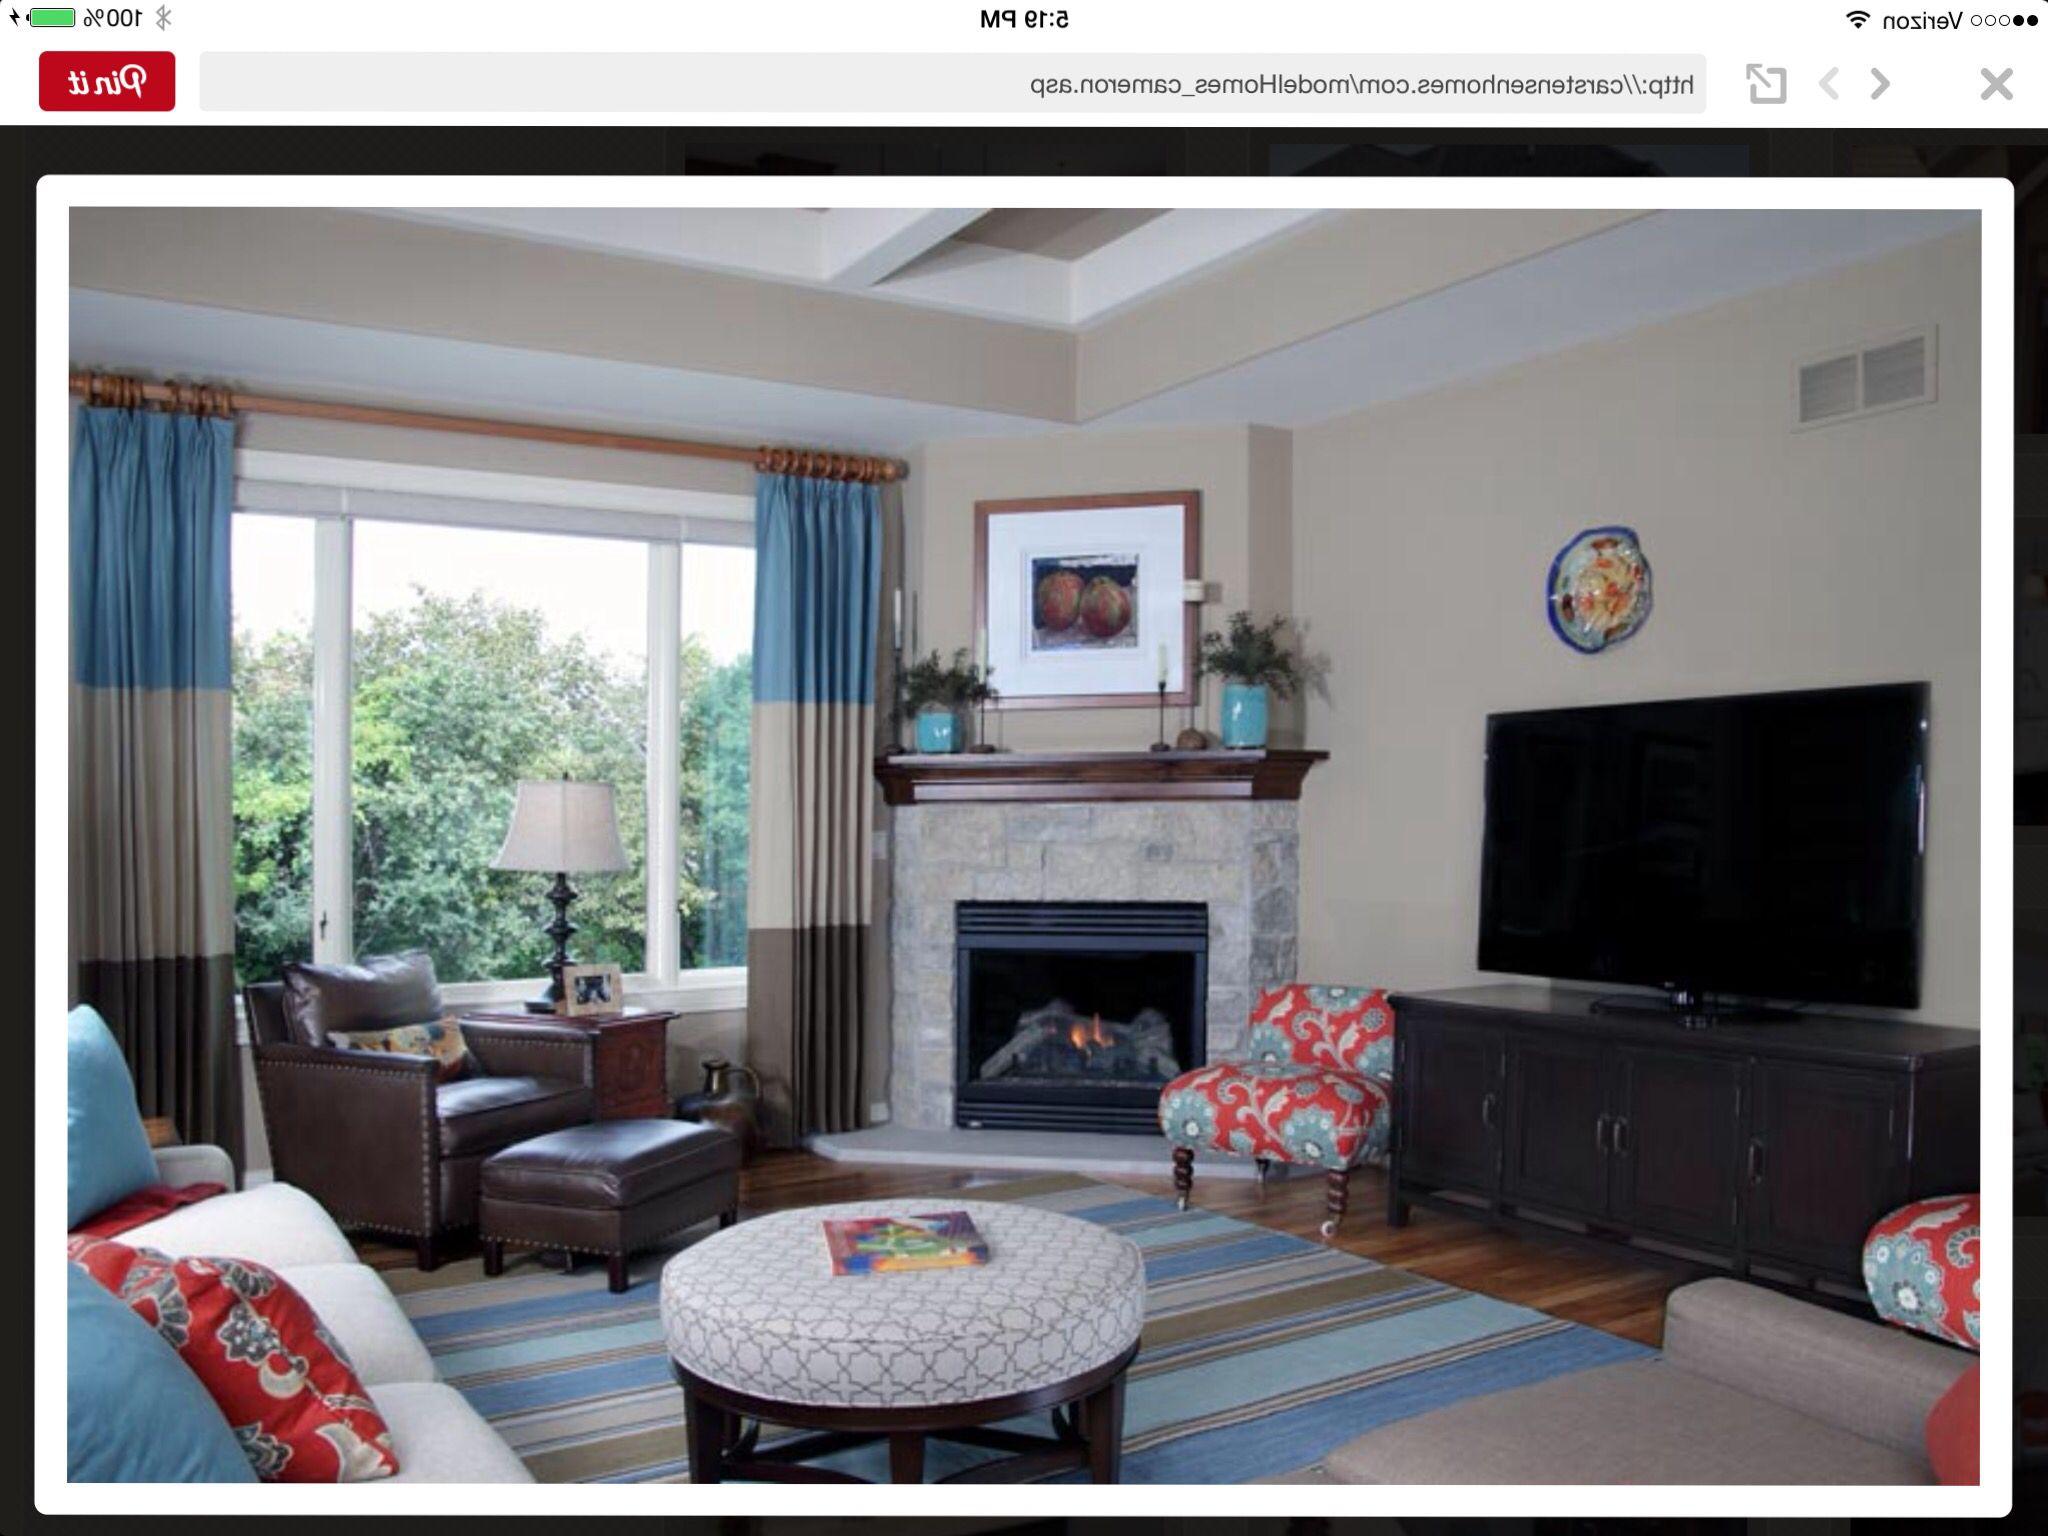 Room Arranging: Furniture Arrangement With Corner FP